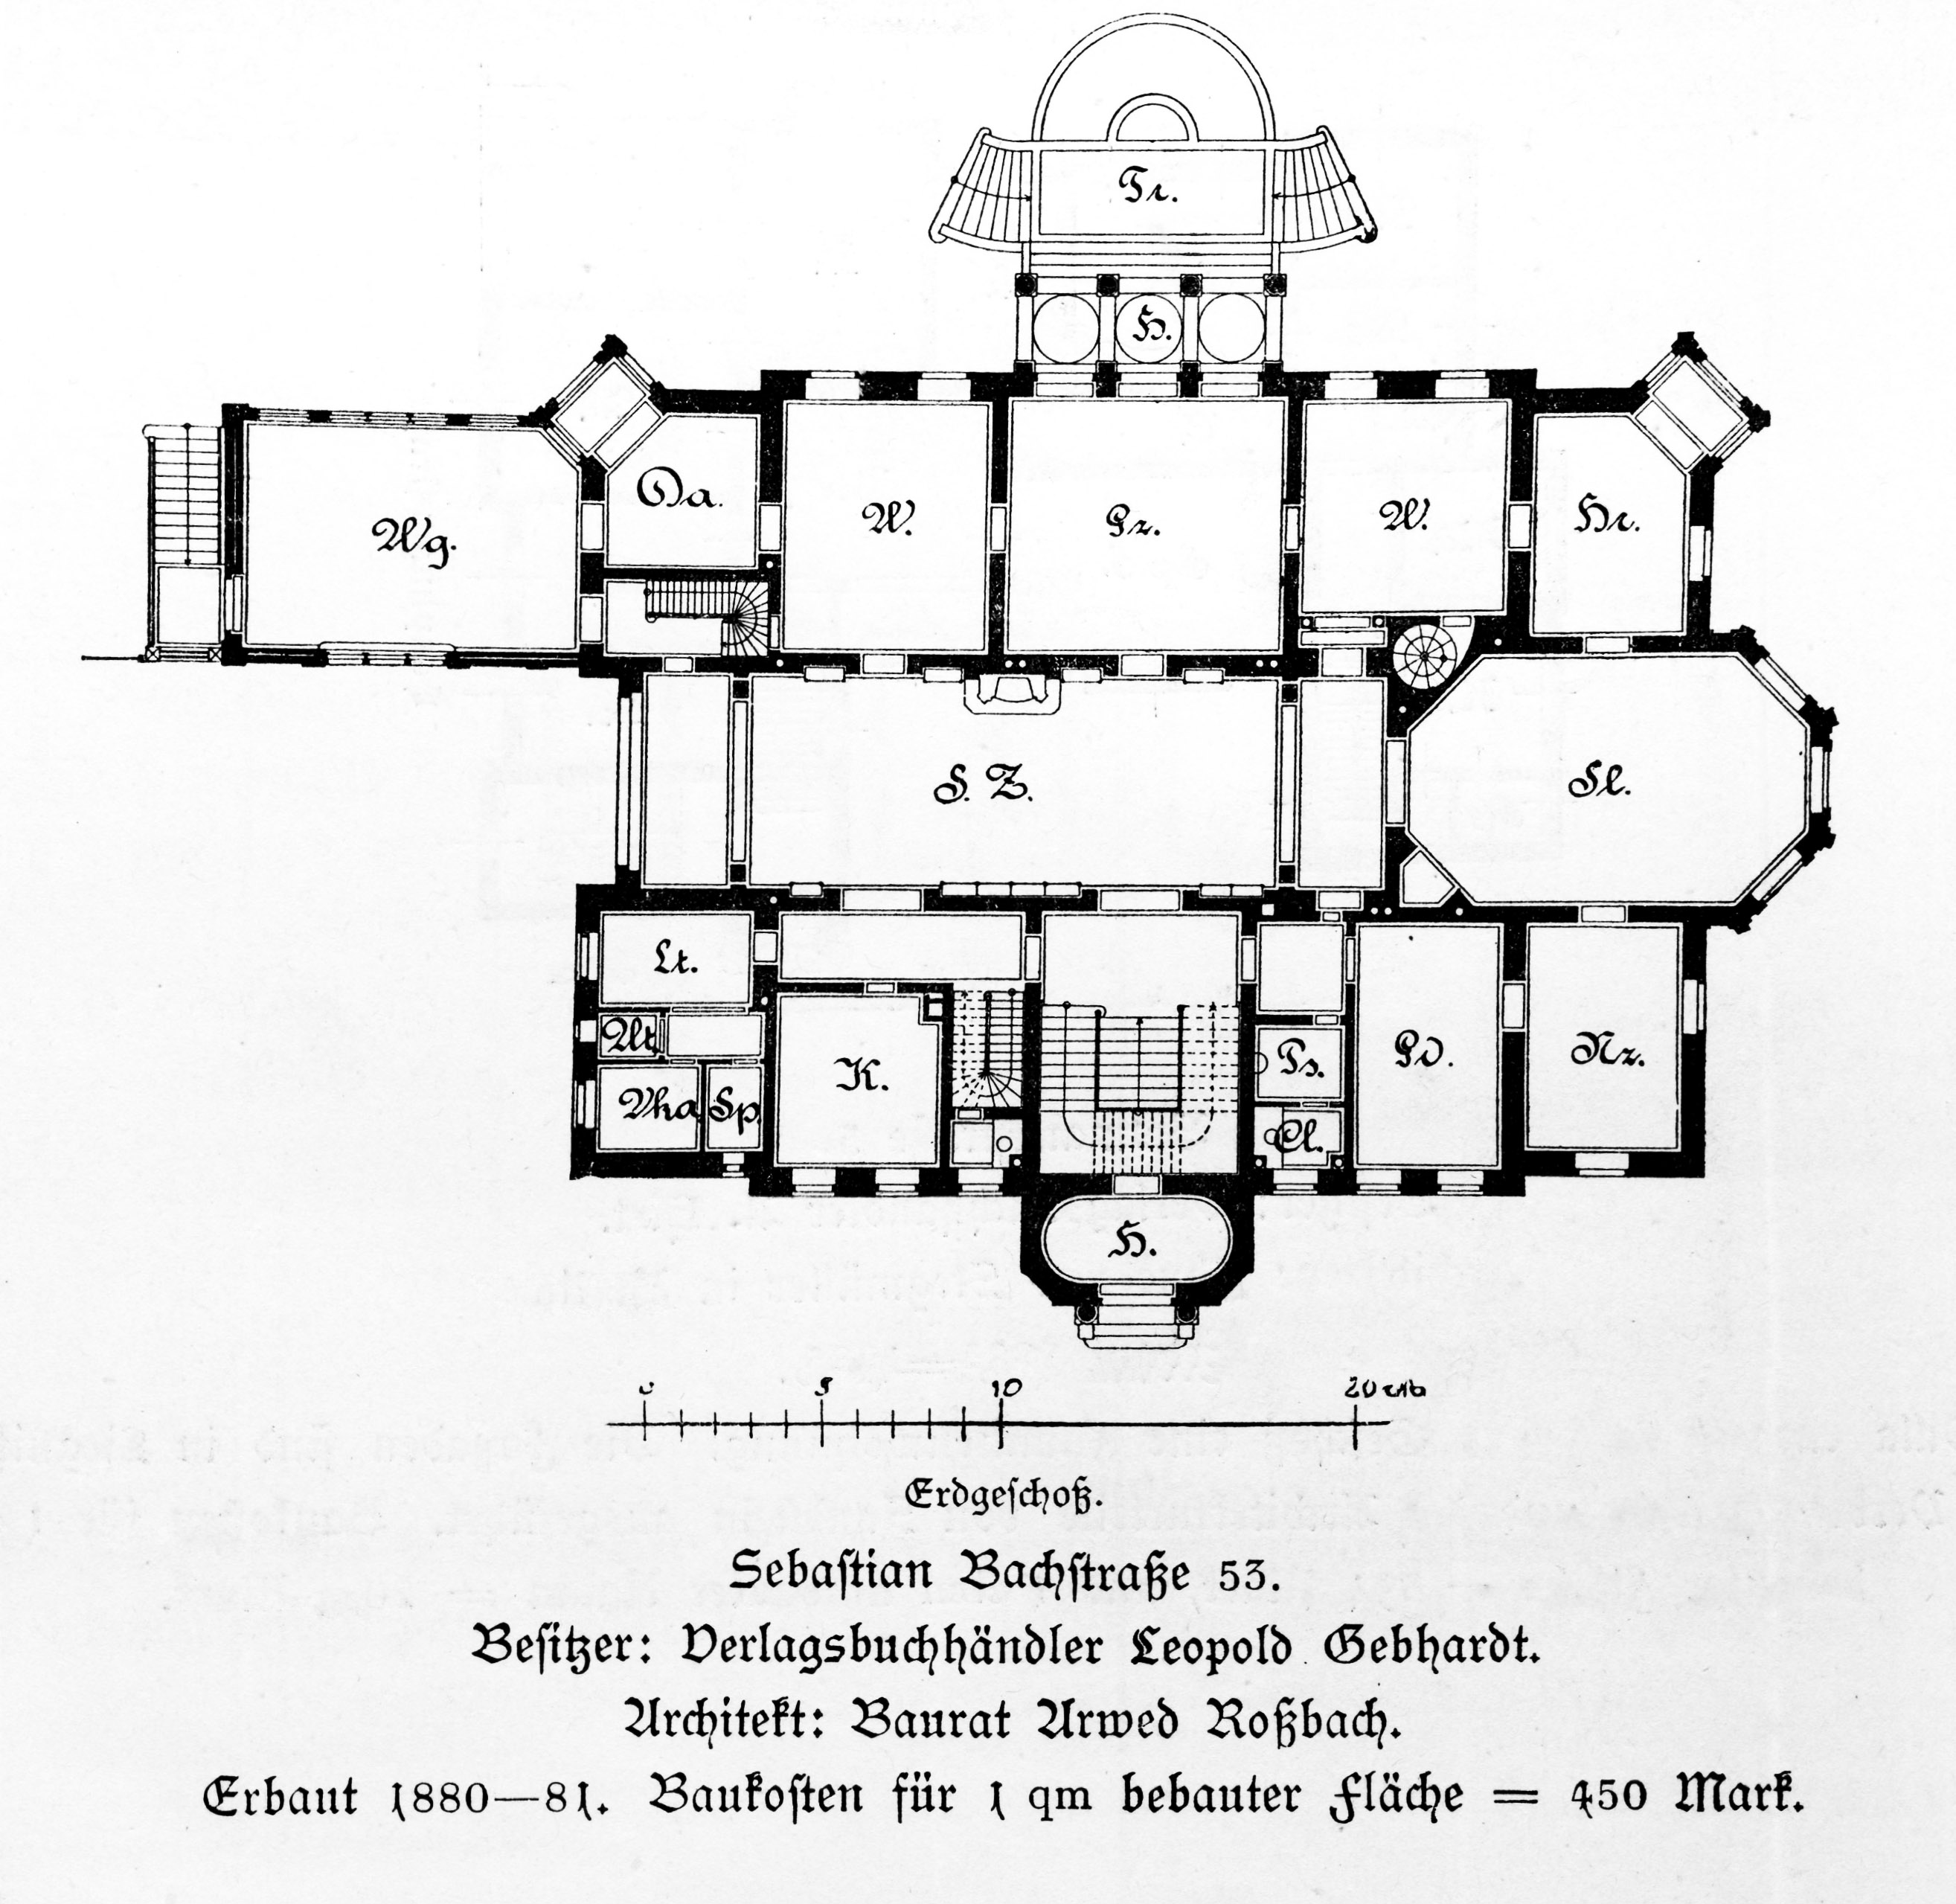 datei leipziger sebastian bach str 53 grundriss jpg wikipedia. Black Bedroom Furniture Sets. Home Design Ideas